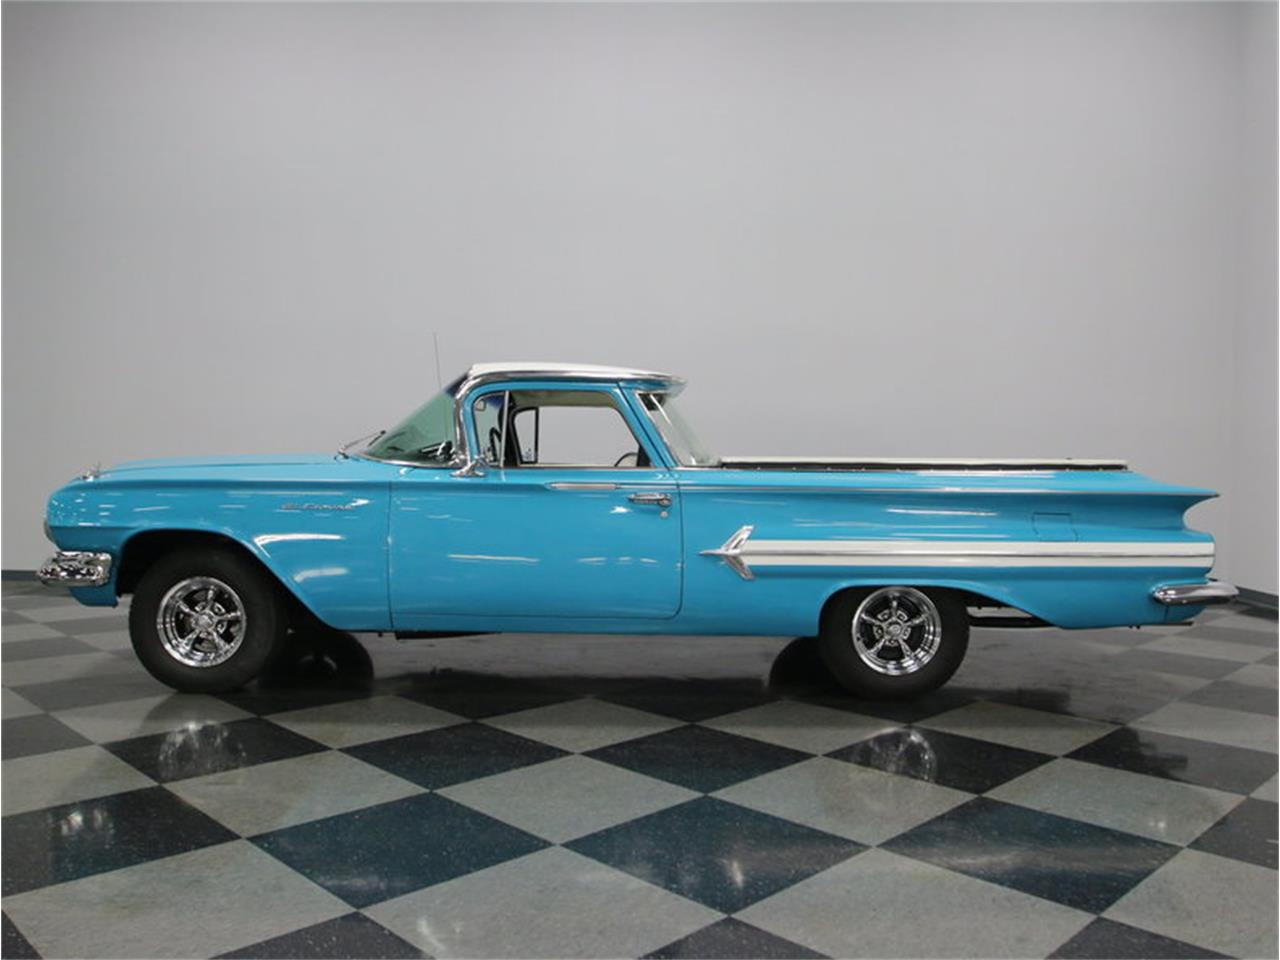 Large Picture of Classic '60 Chevrolet El Camino located in Lavergne Tennessee - $39,995.00 - L6AL